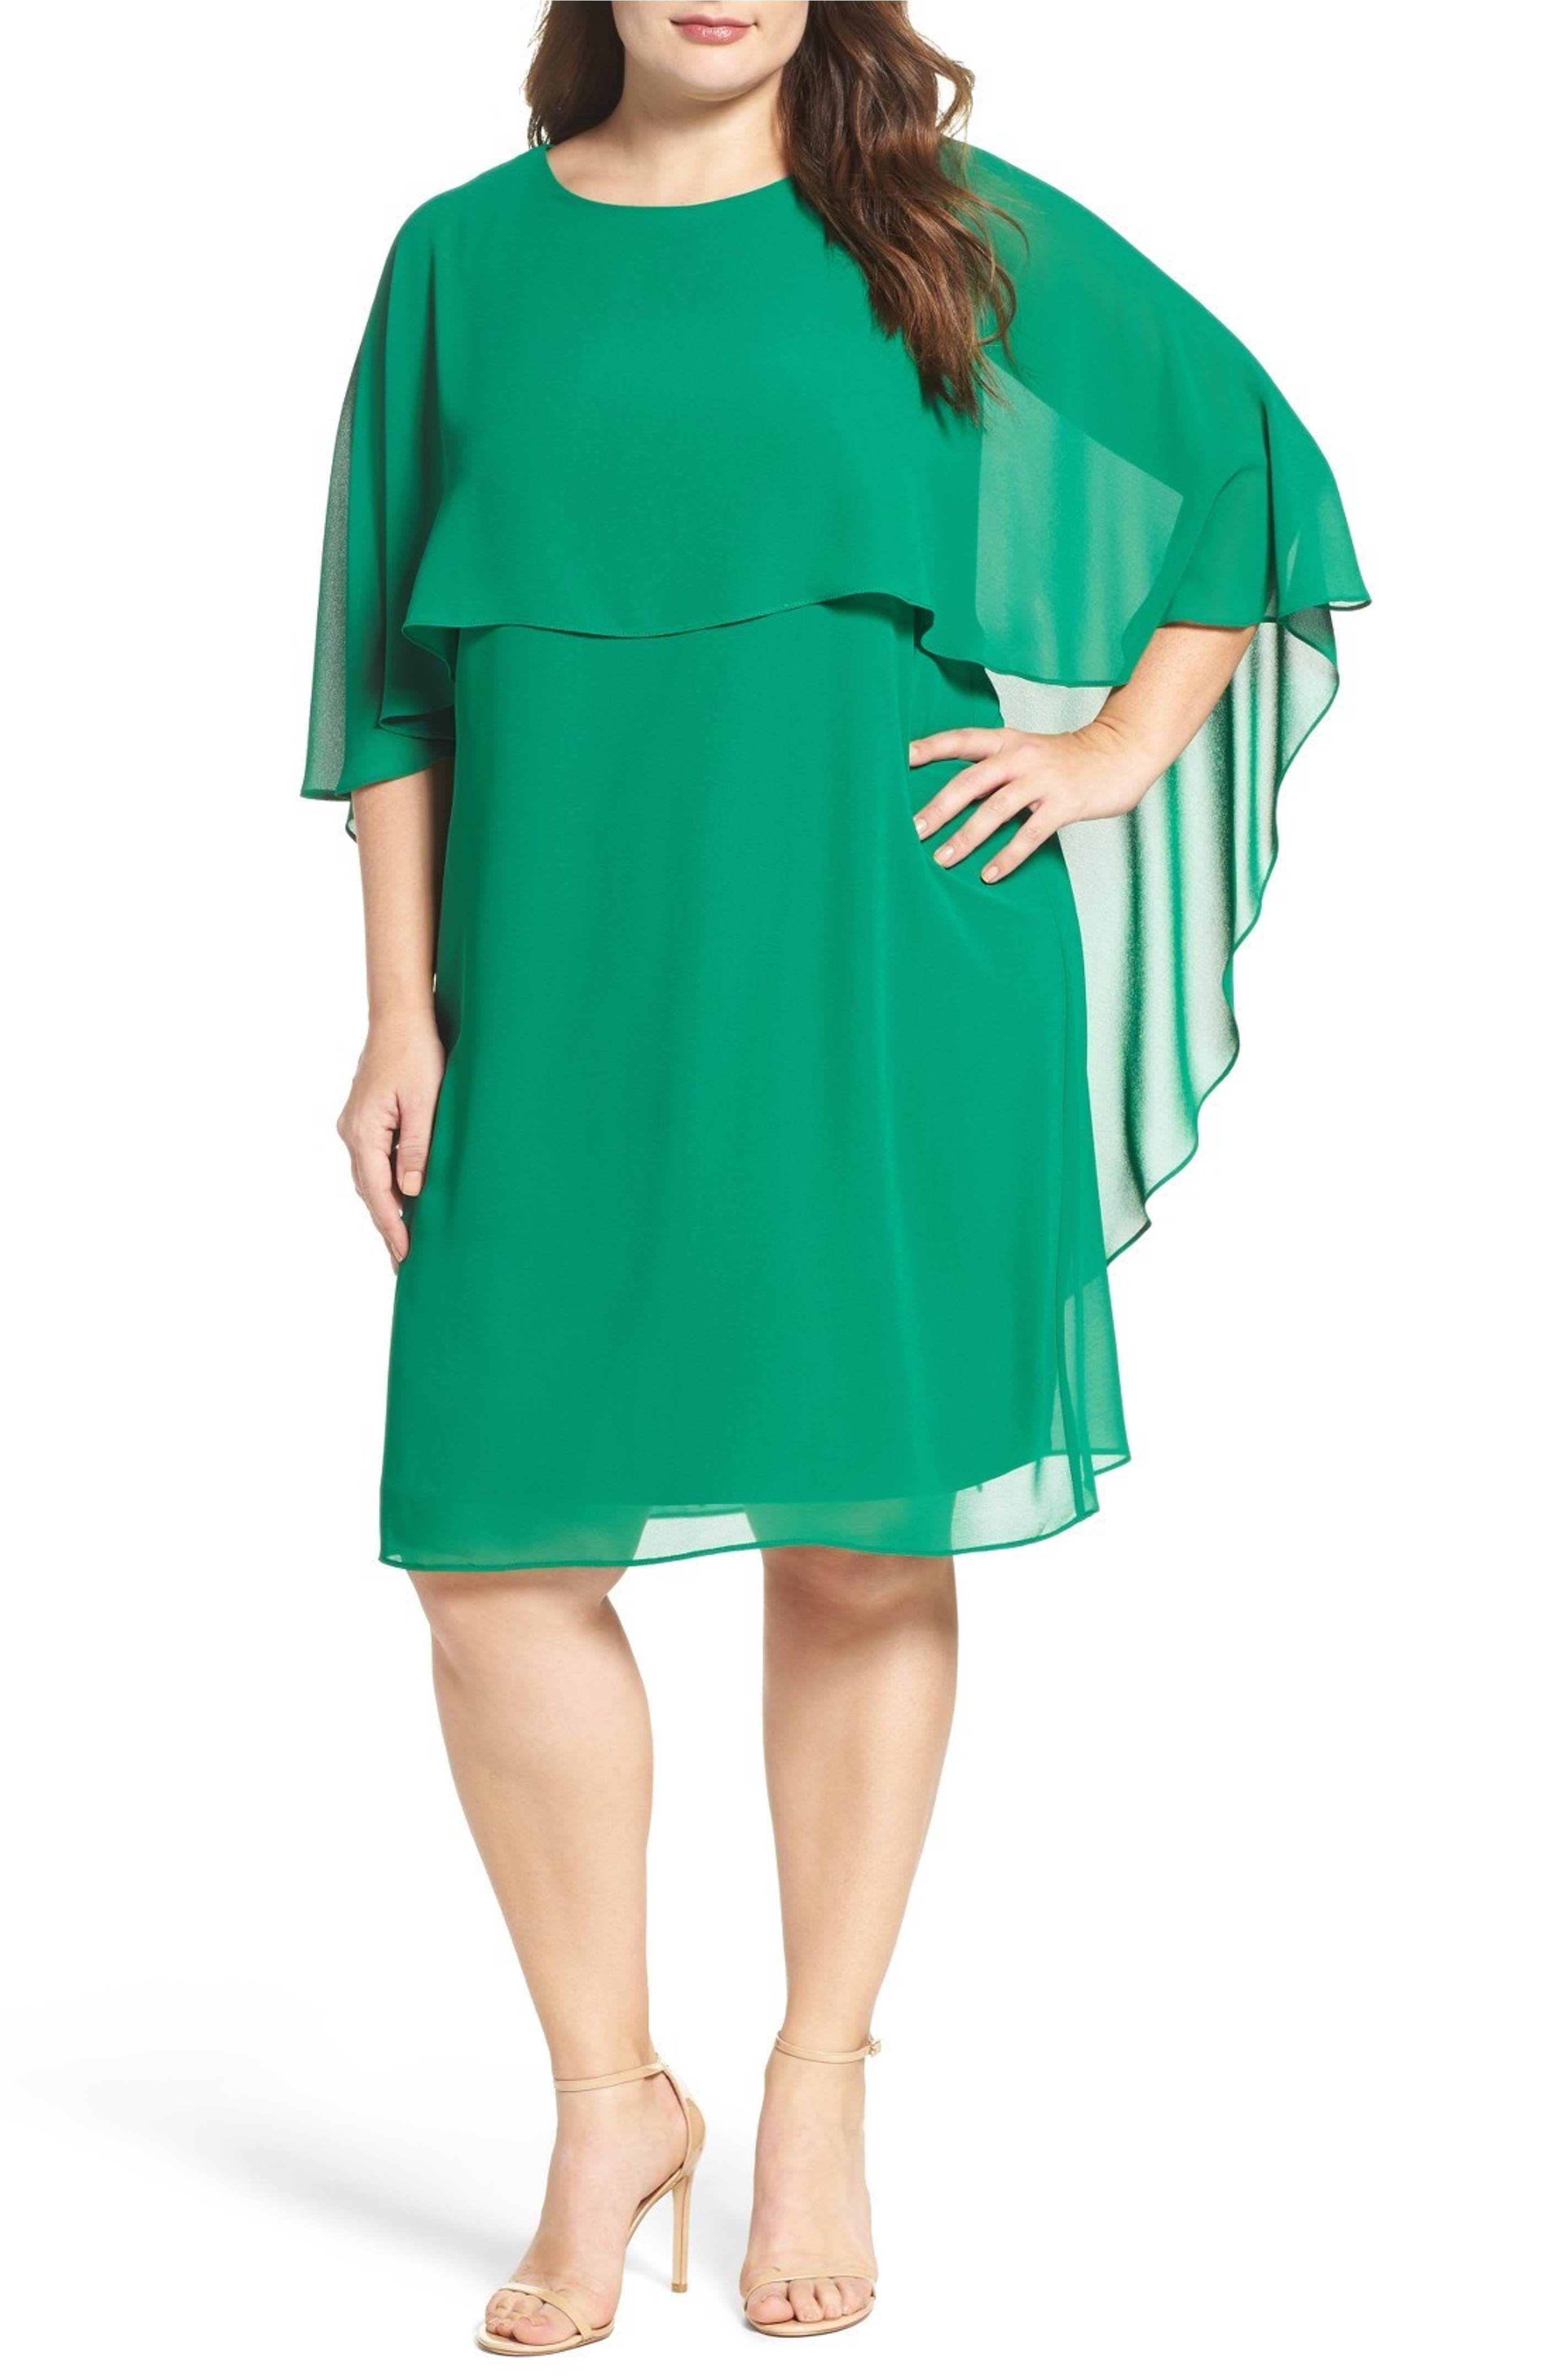 Main Image Vince Camuto Chiffon Cape Sheath Dress Plus Size Plus Size Dresses Plus Size Outfits Clothes Design [ 4320 x 2816 Pixel ]